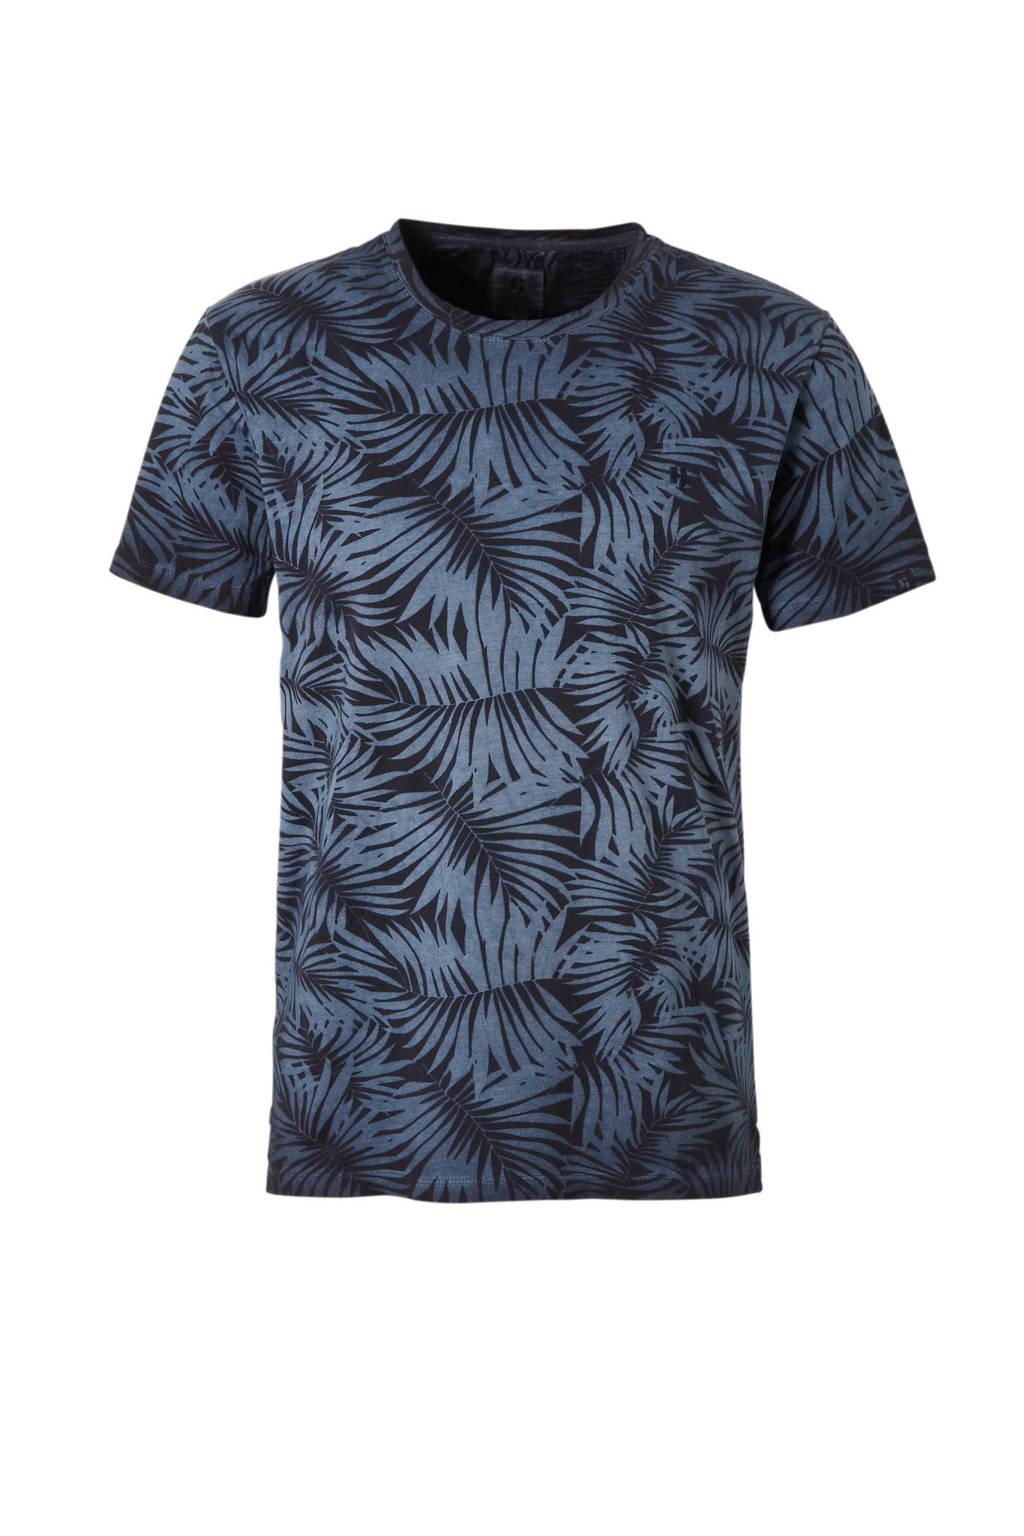 Garcia T-shirt met print, Blauw